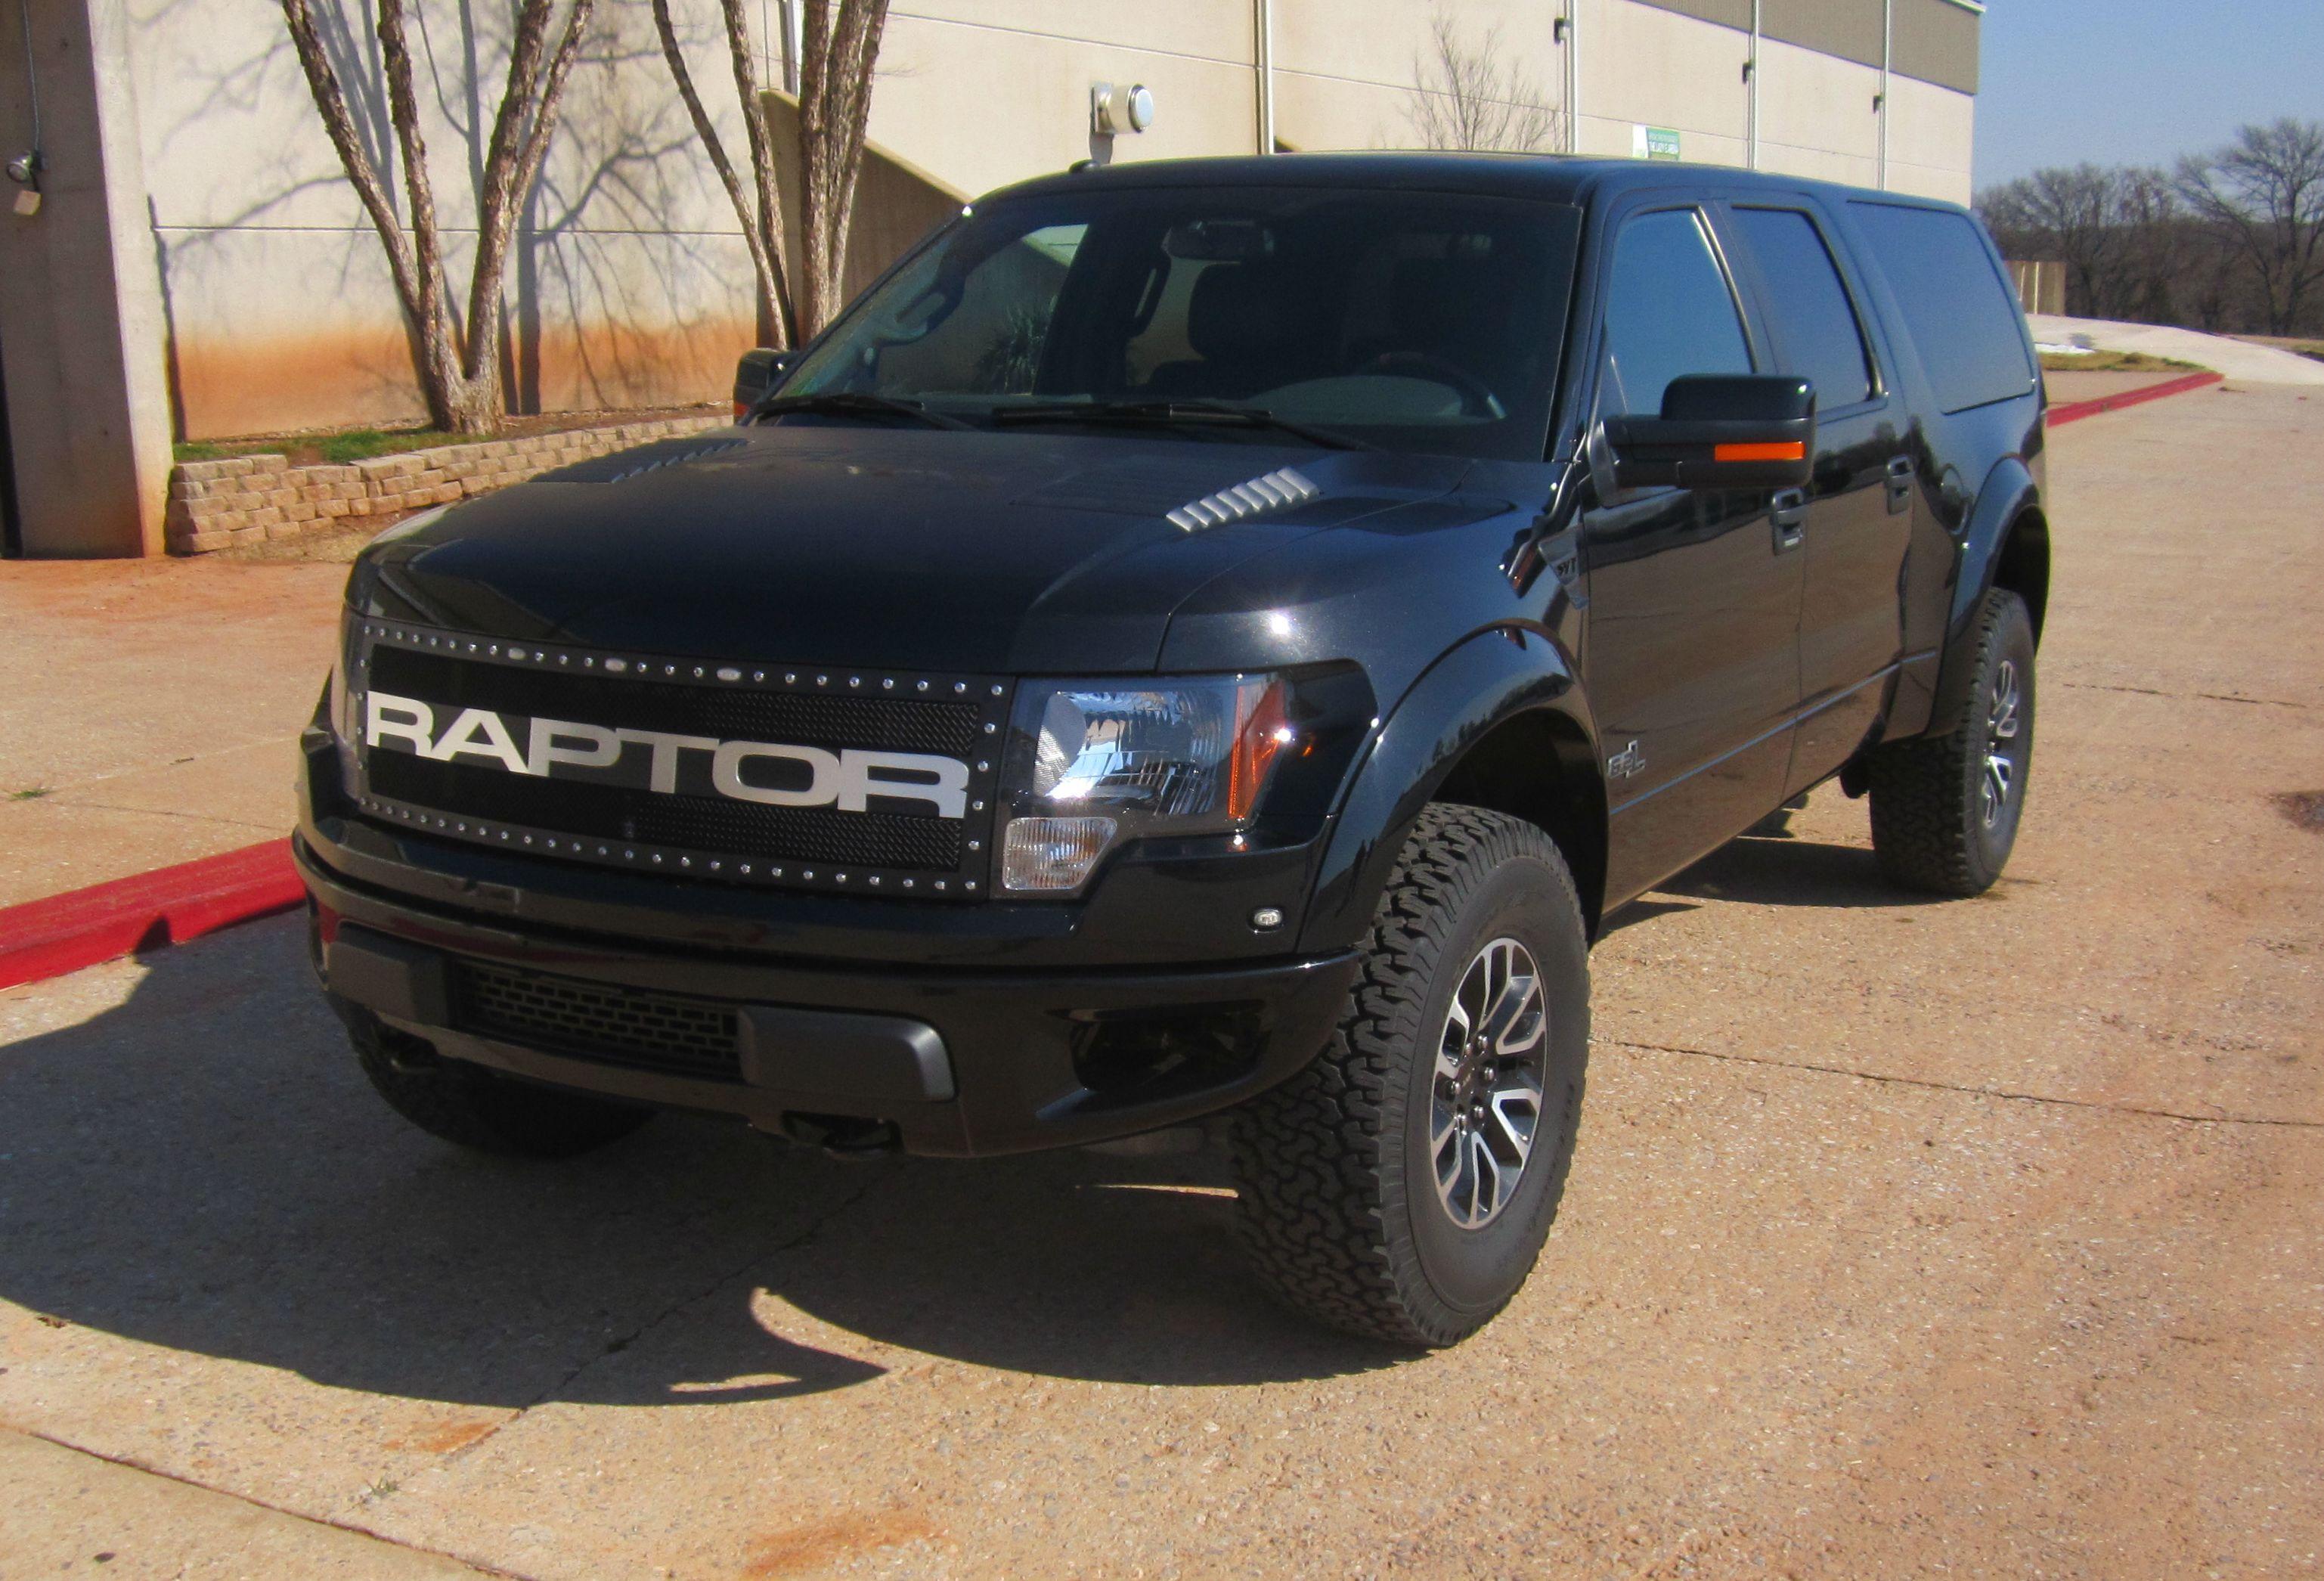 Ford Raptor Suv Conversion Suv Ford Raptor Ford Trucks